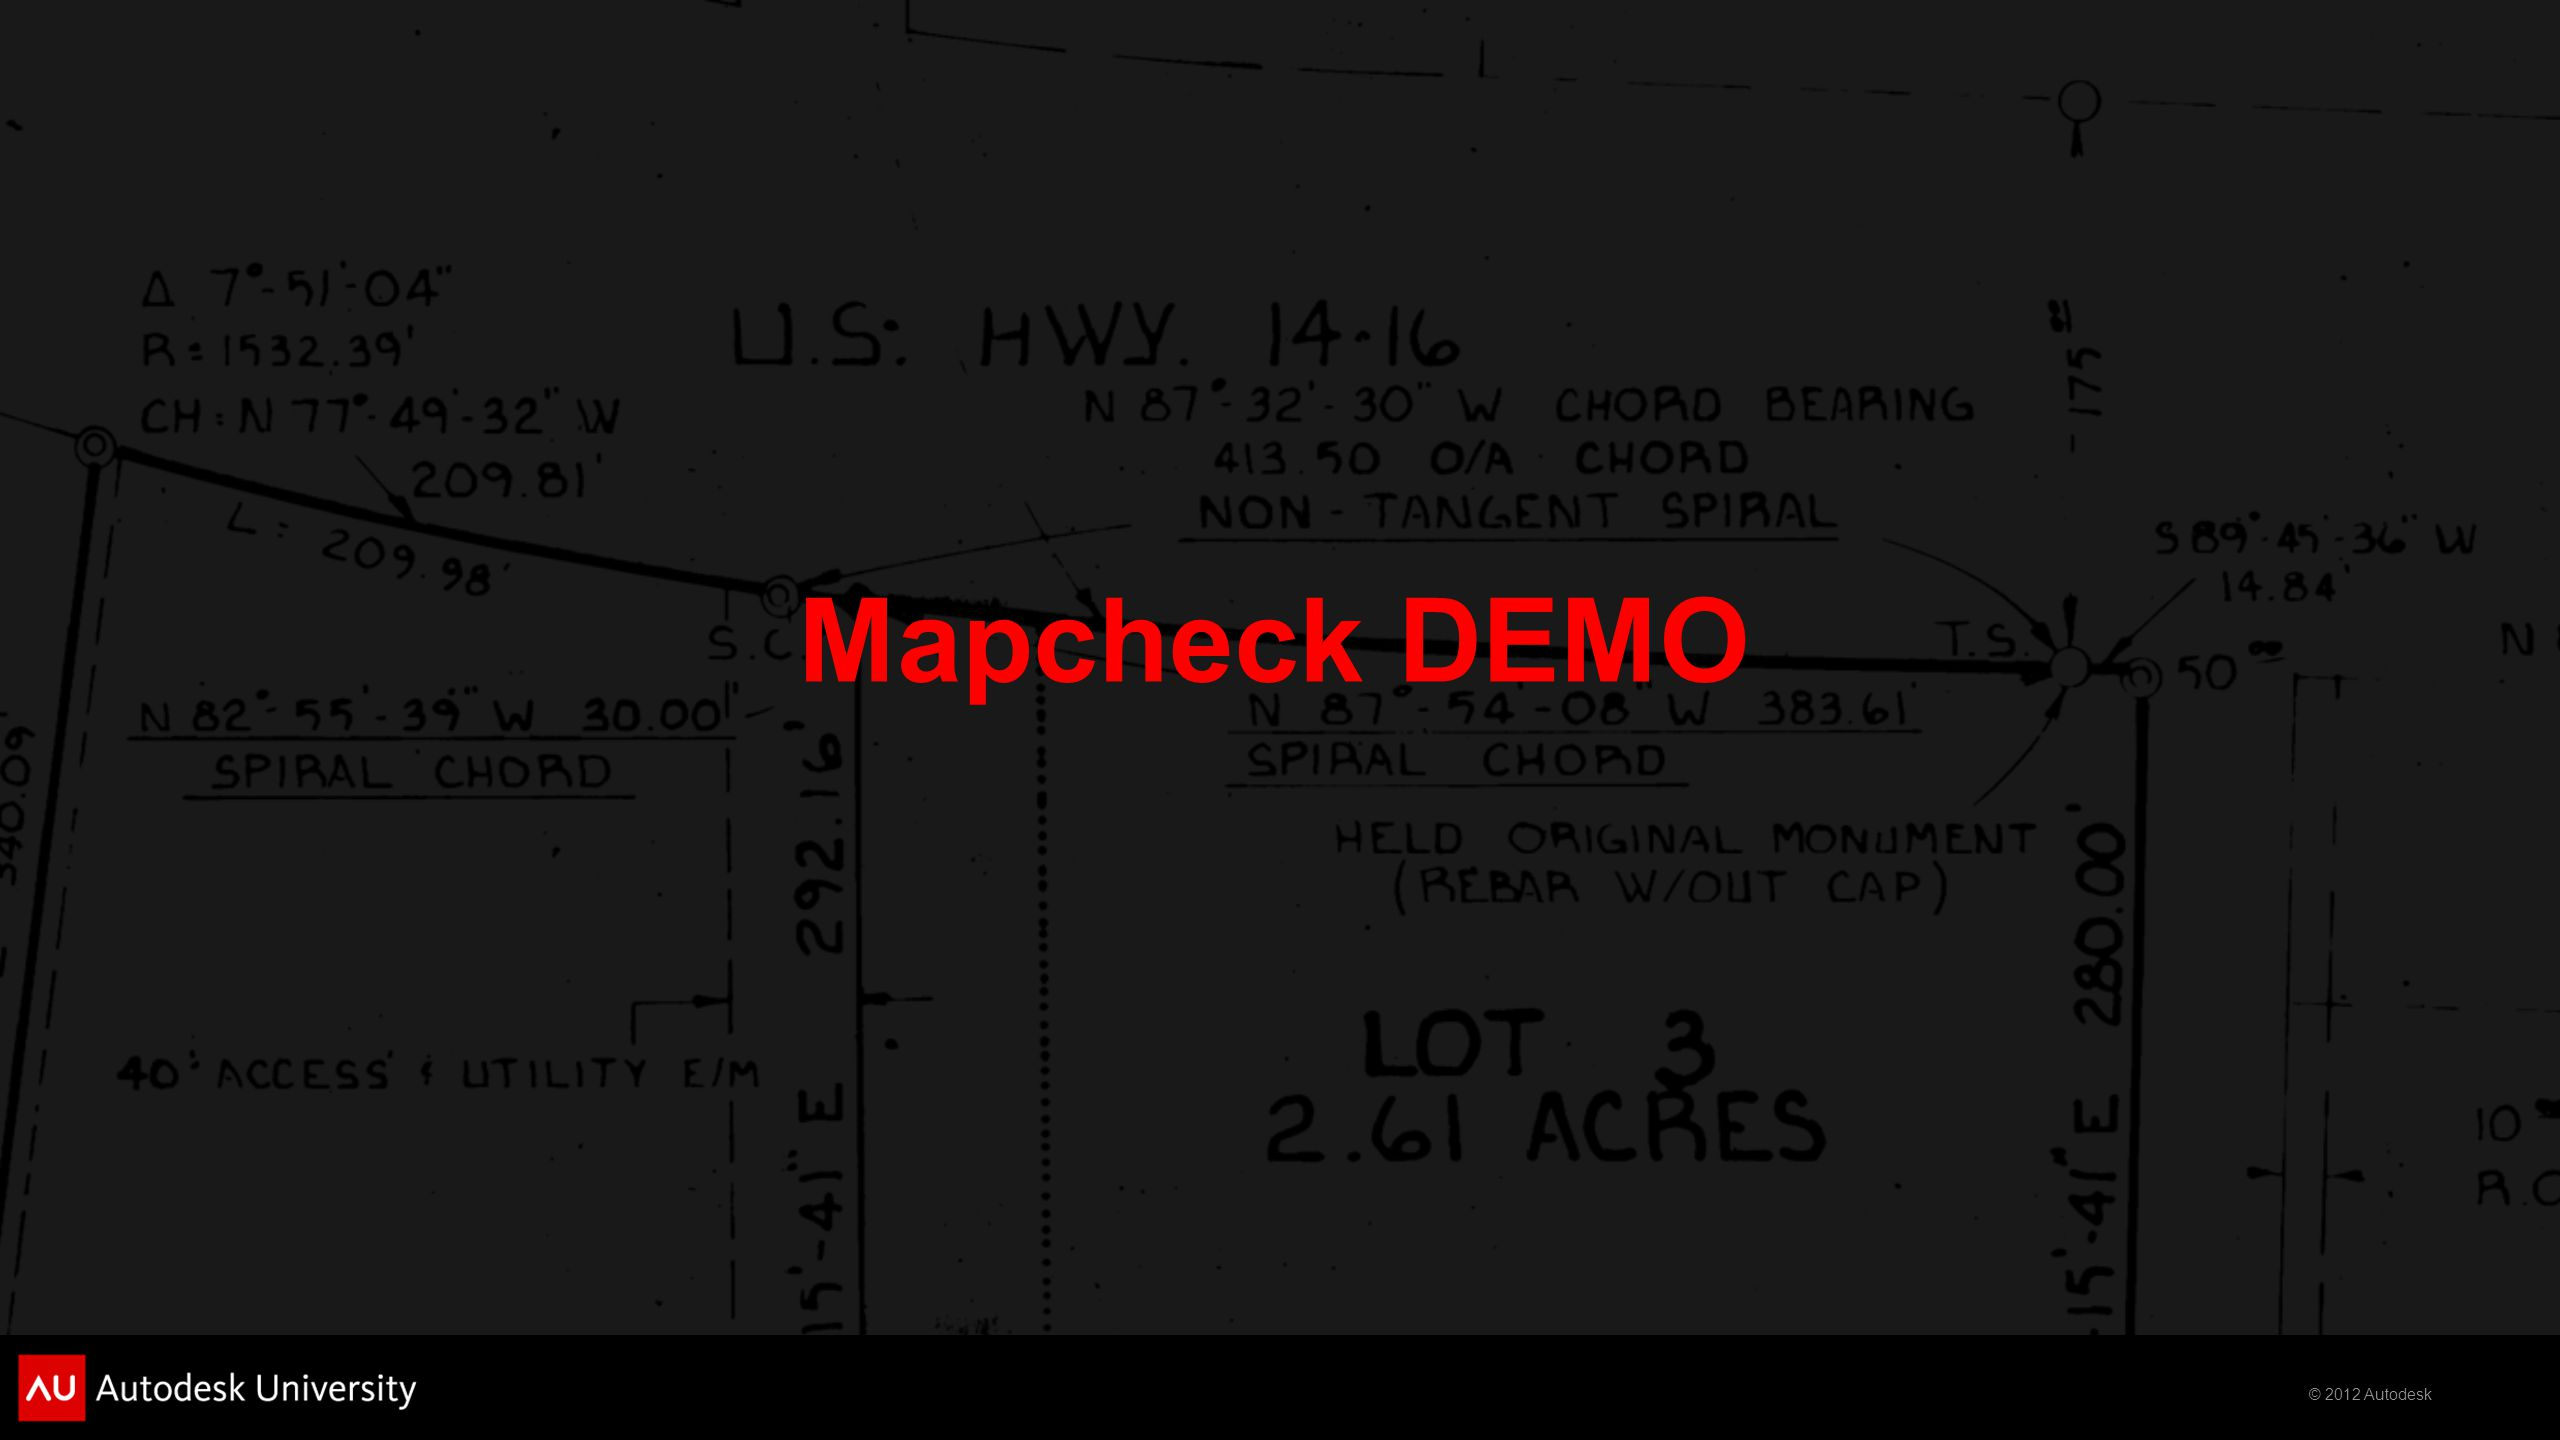 Mapcheck DEMO